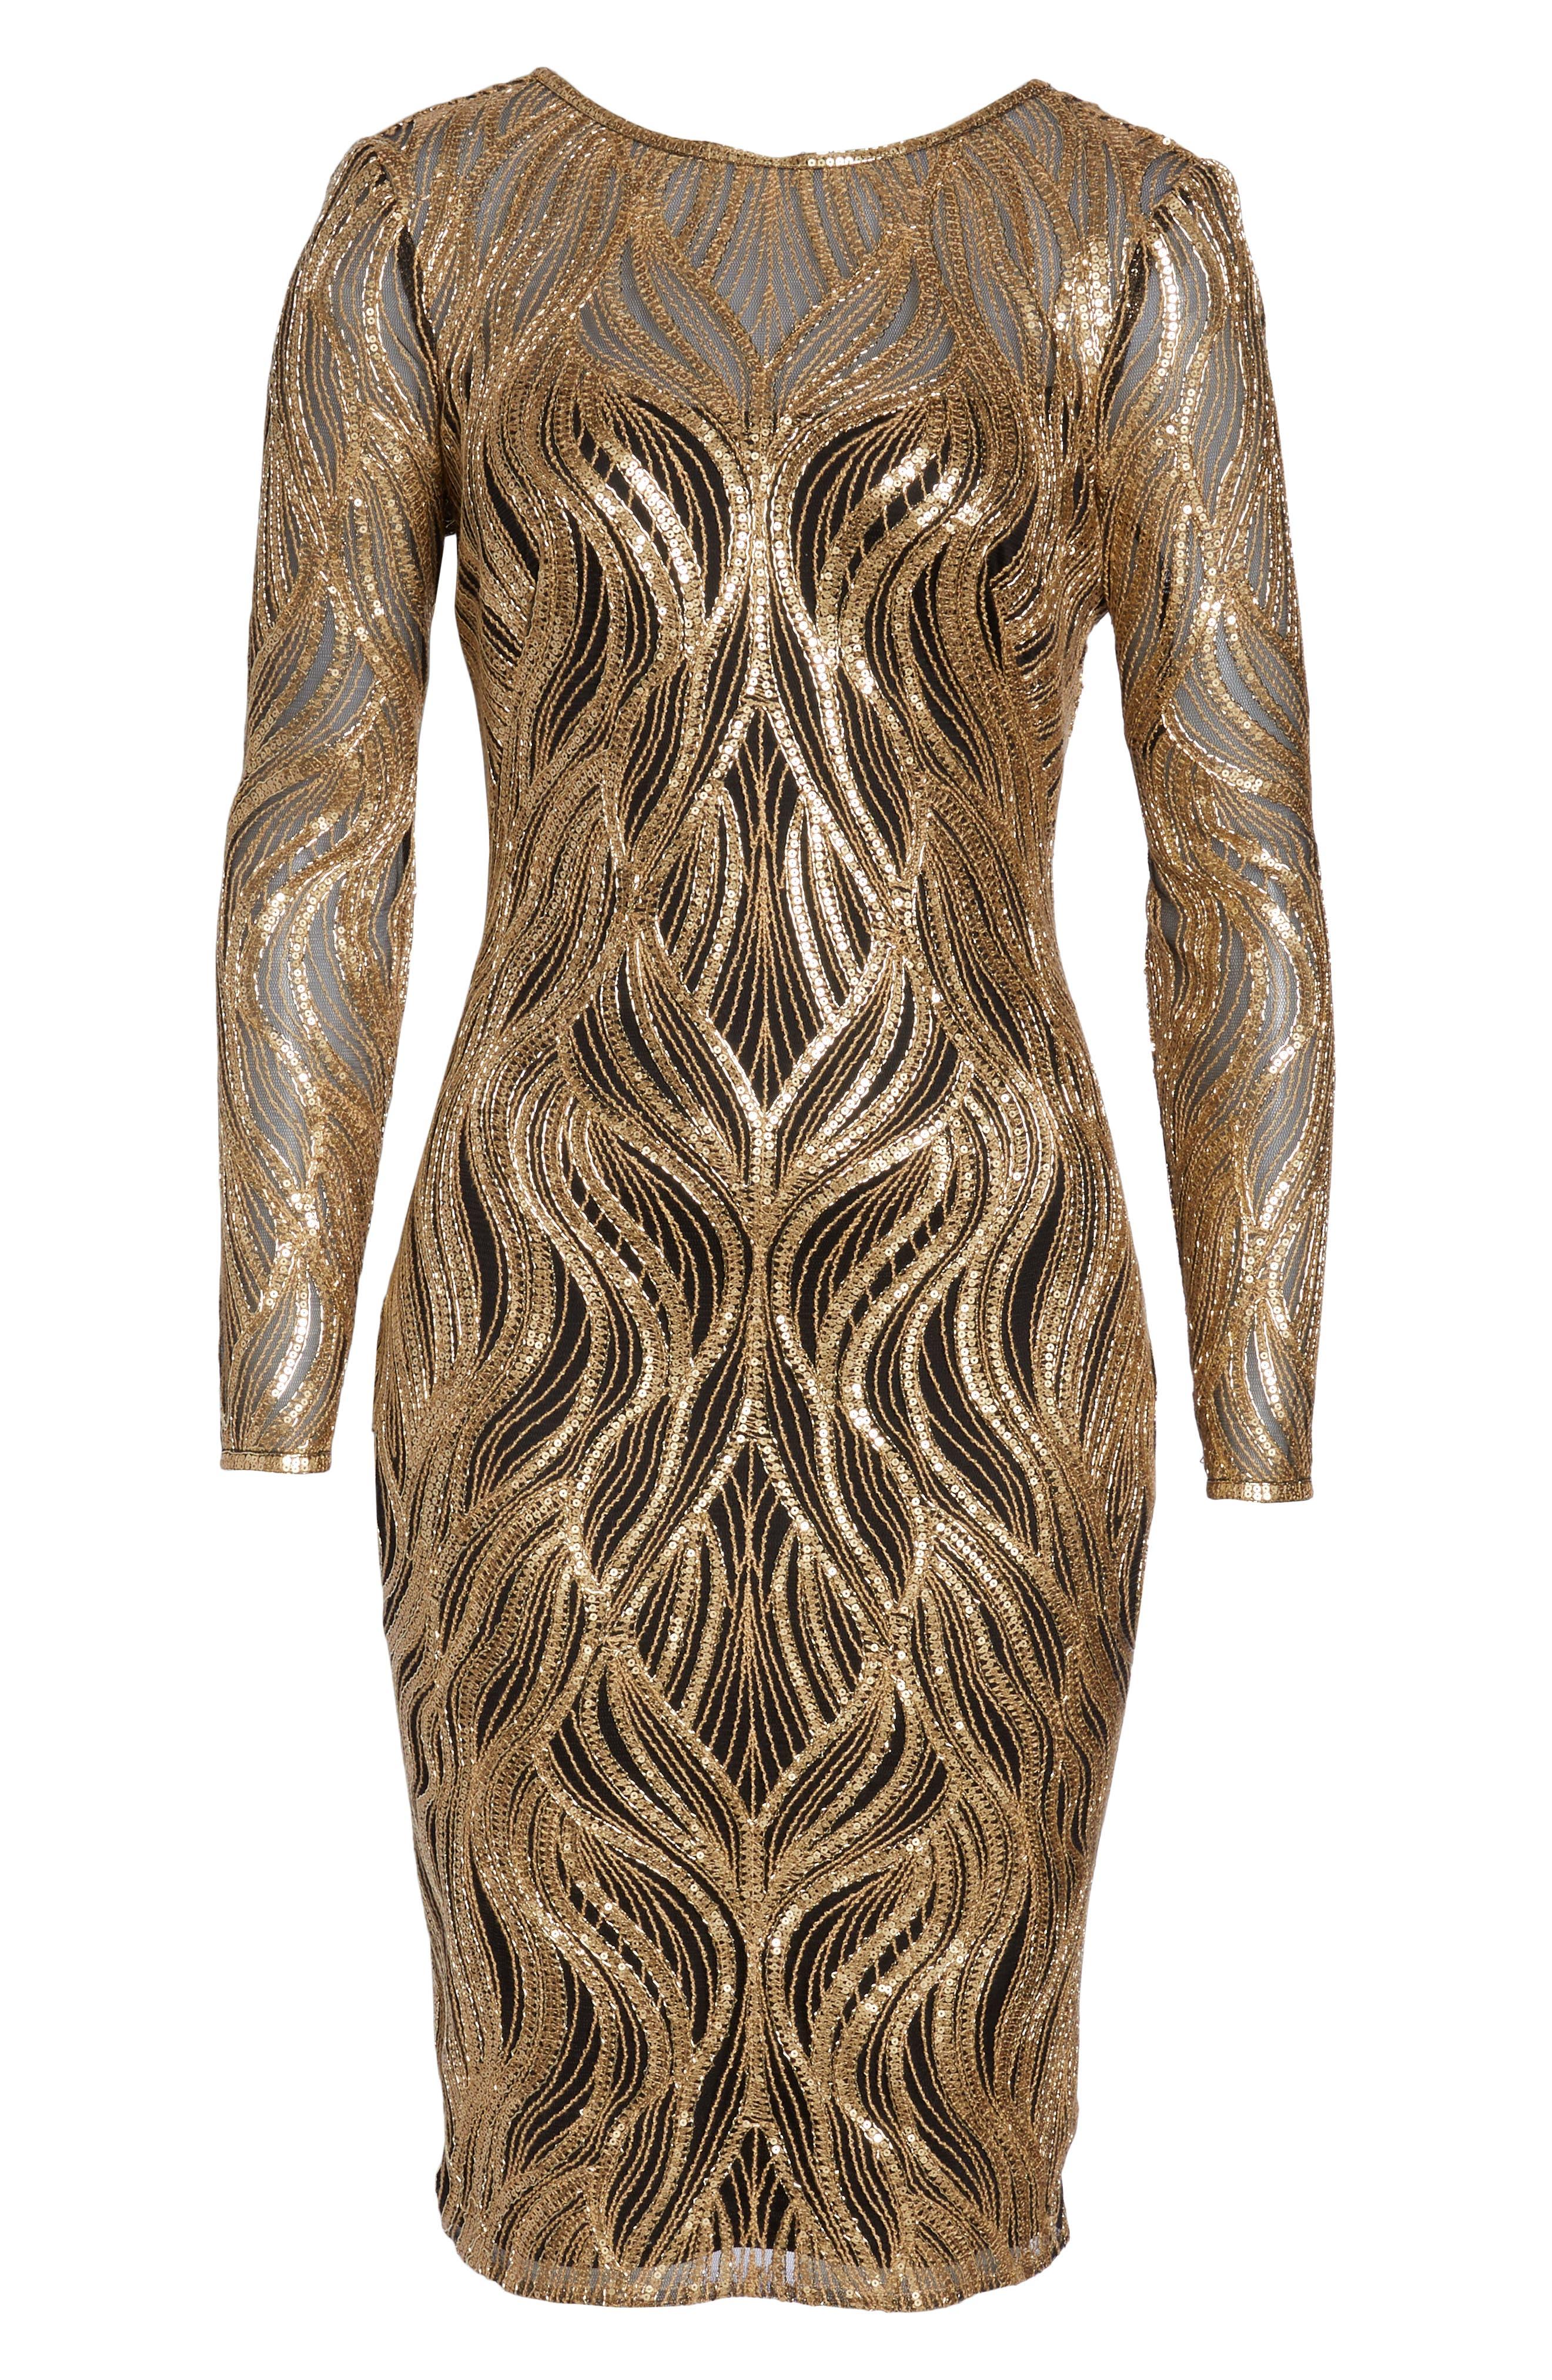 TADASHI SHOJI, Long Sleeve Sequin Mesh Cocktail Dress, Alternate thumbnail 7, color, GOLD/ BLACK